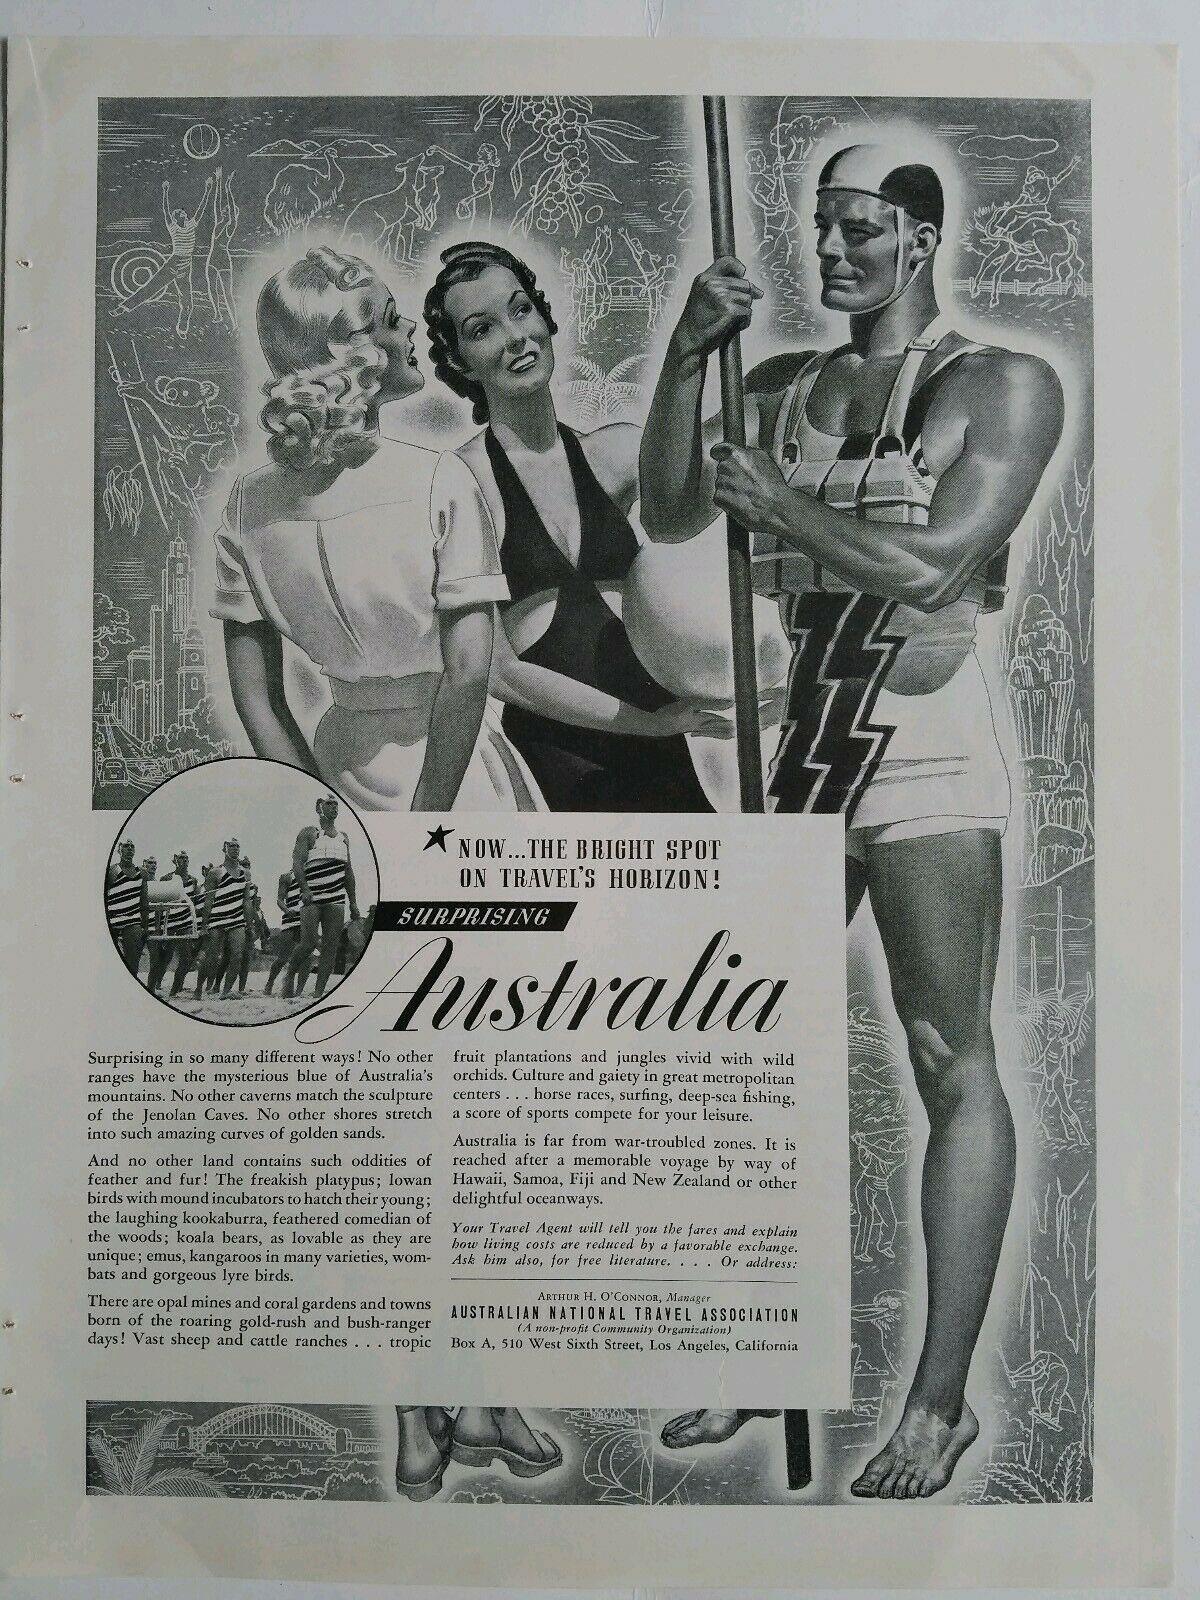 Vintage travel ad for Australia